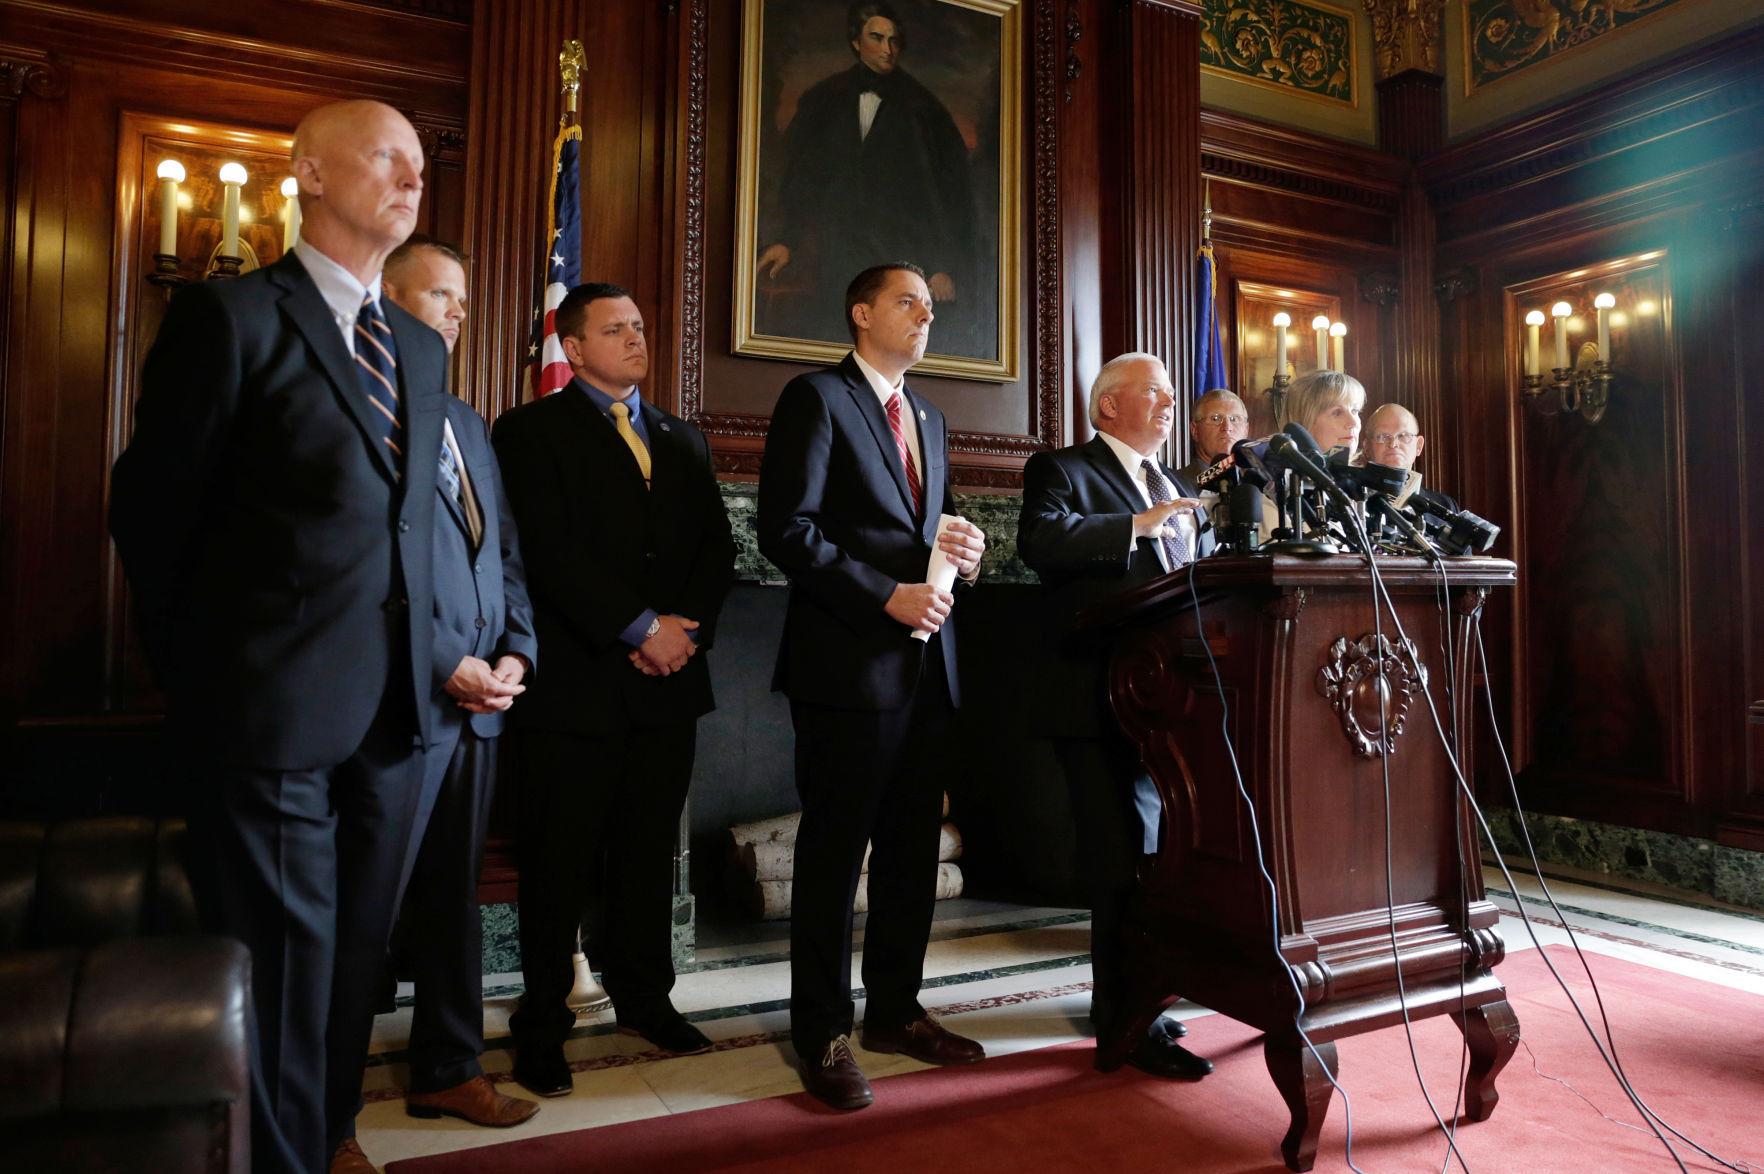 Senate opens debate on Wisconsin budget